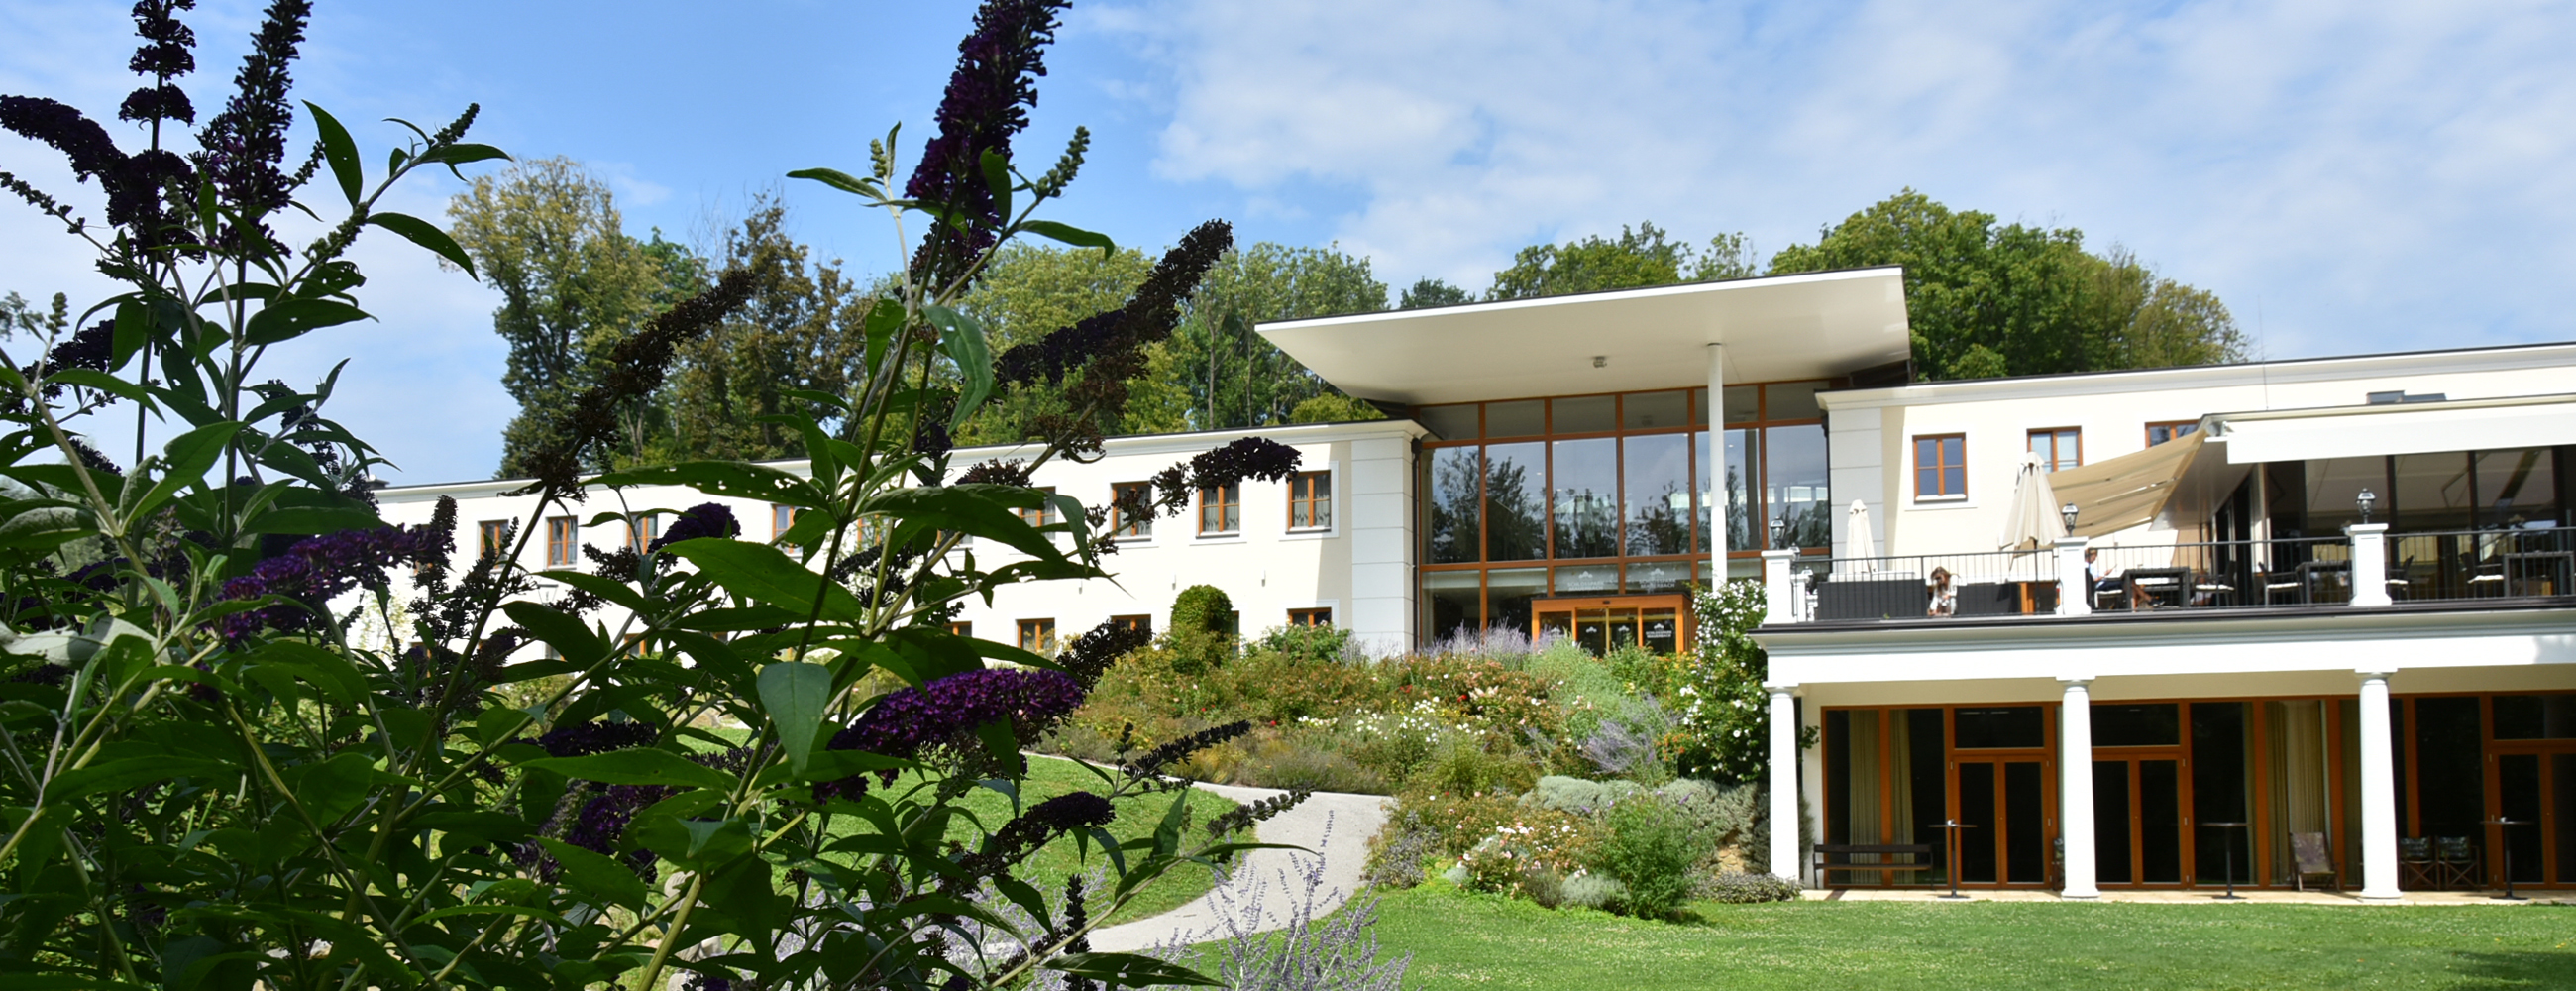 Schlosspark Mauerbach: Home